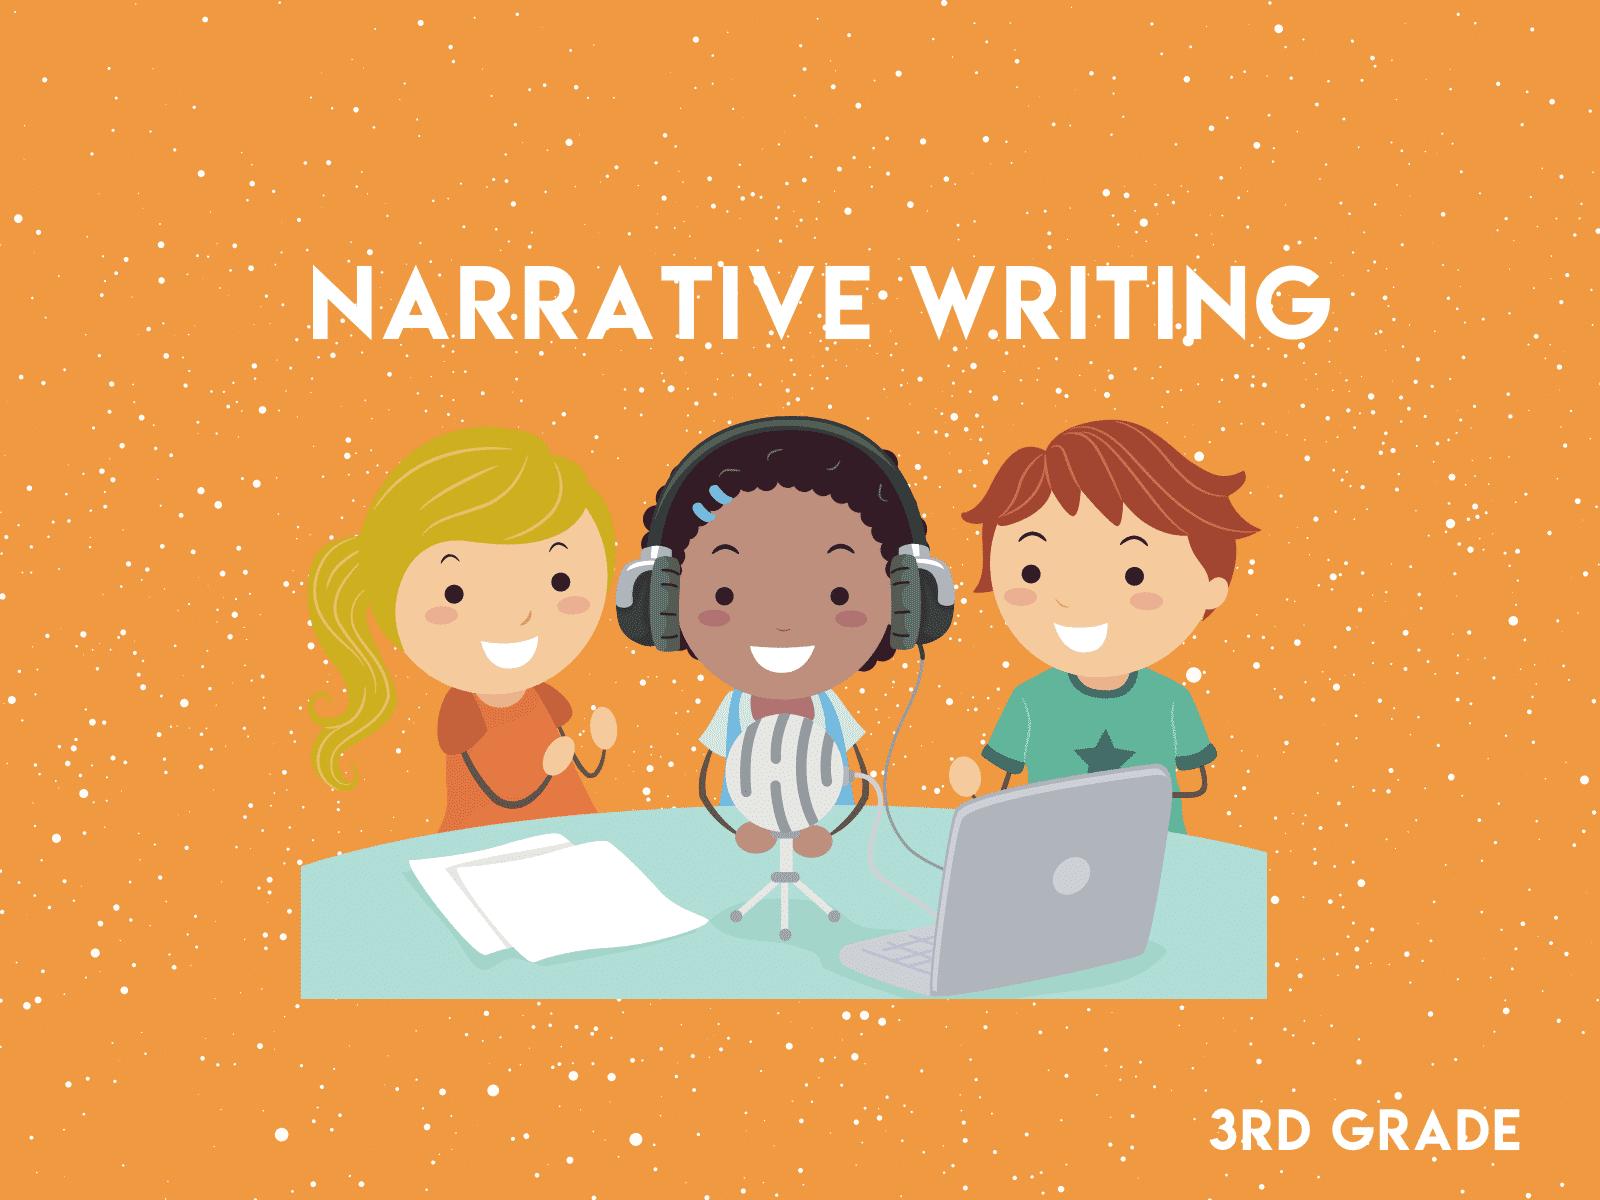 Narrative Writing 3rd Grade